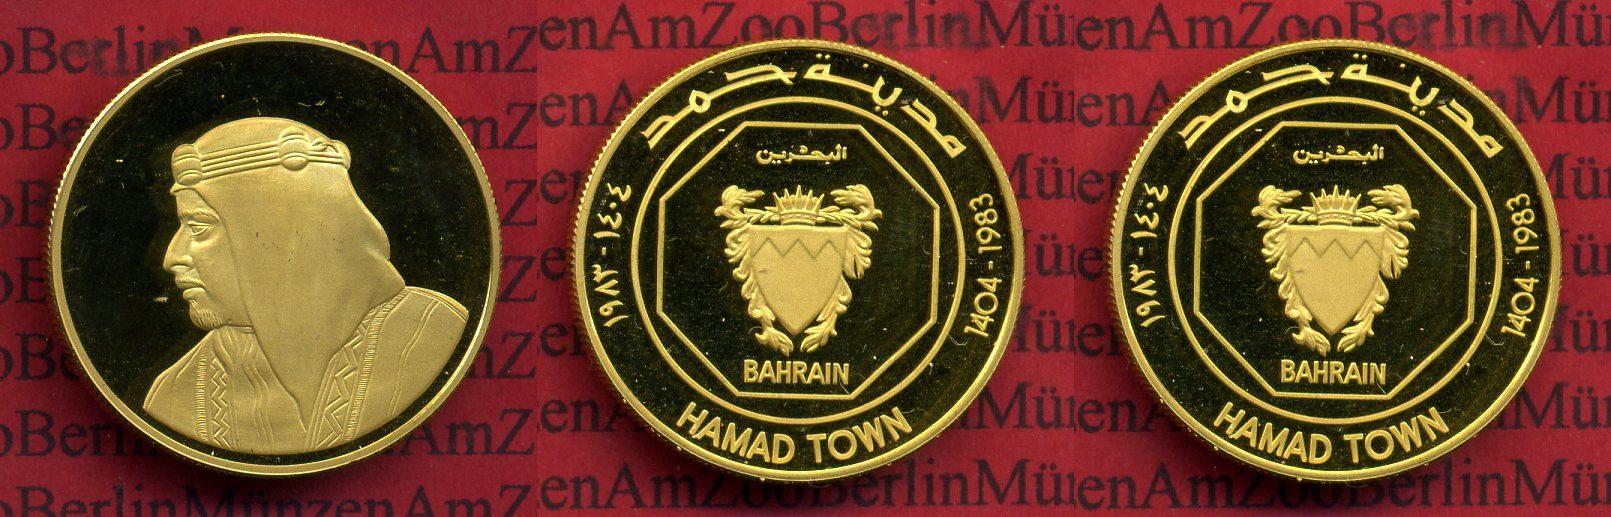 Goldmünze 50 Dinar Hamad Town 1983 Bahrain Bahrain 50 Dinar 1983 Gold Hamad Town Rare ! Isa Bin Salman proof handling marks